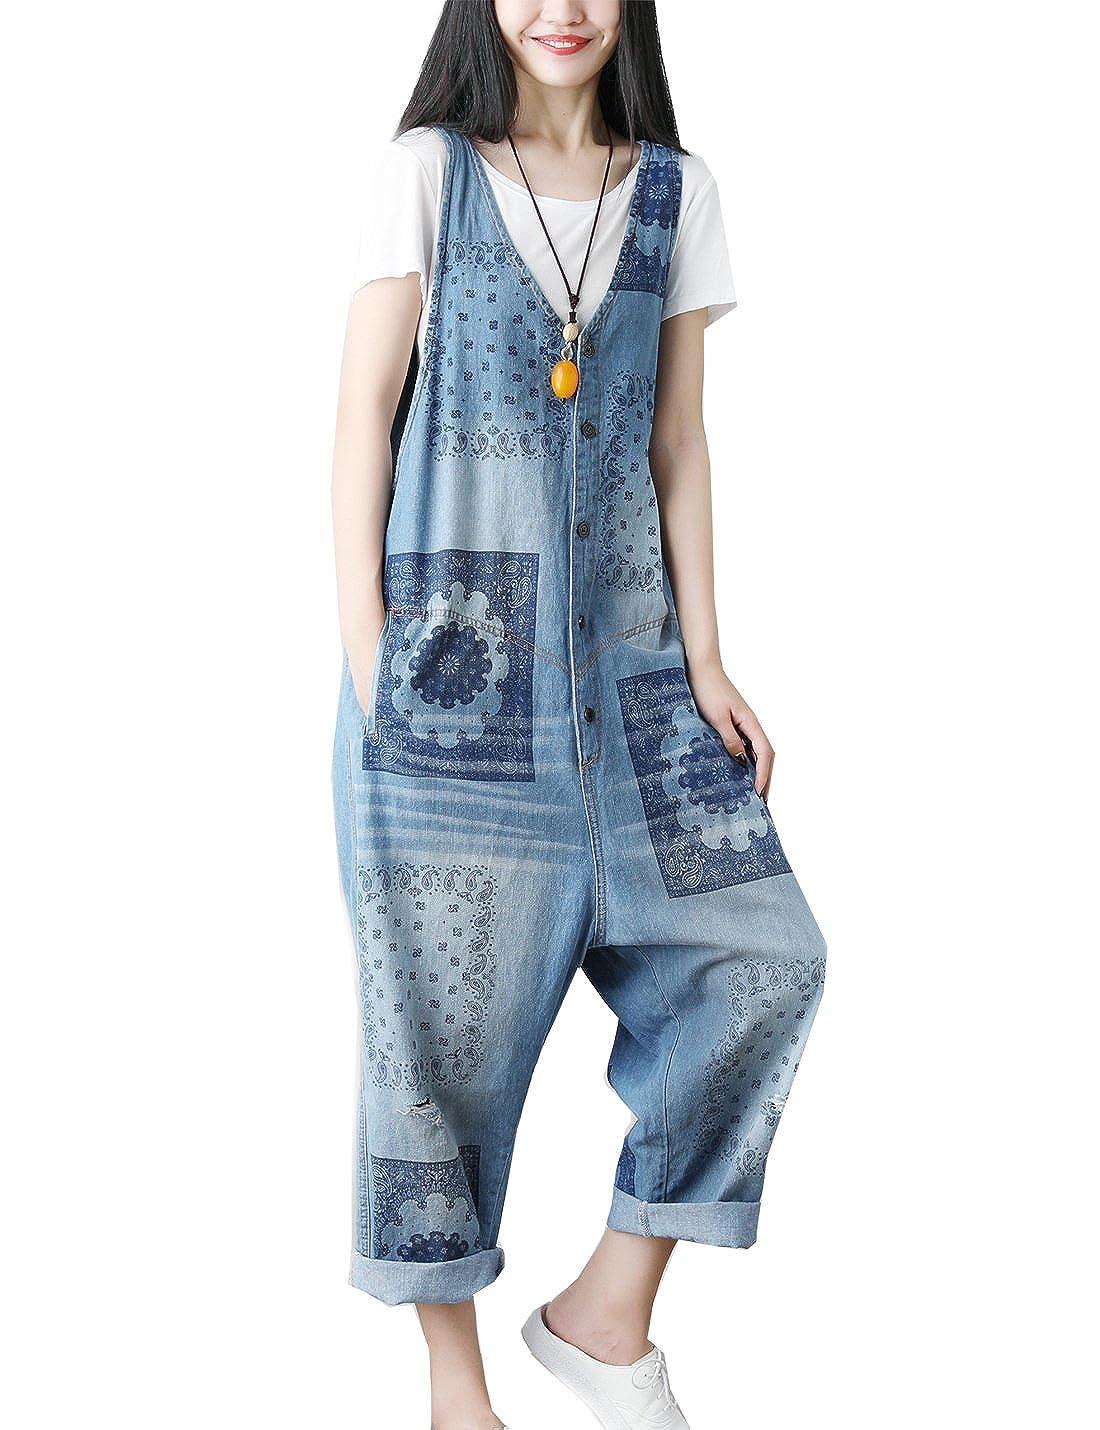 Flygo Womens 2018 New Loose Baggy Denim Wide Leg Floral Printed Jumpsuit Rompers Overalls Harem Pants